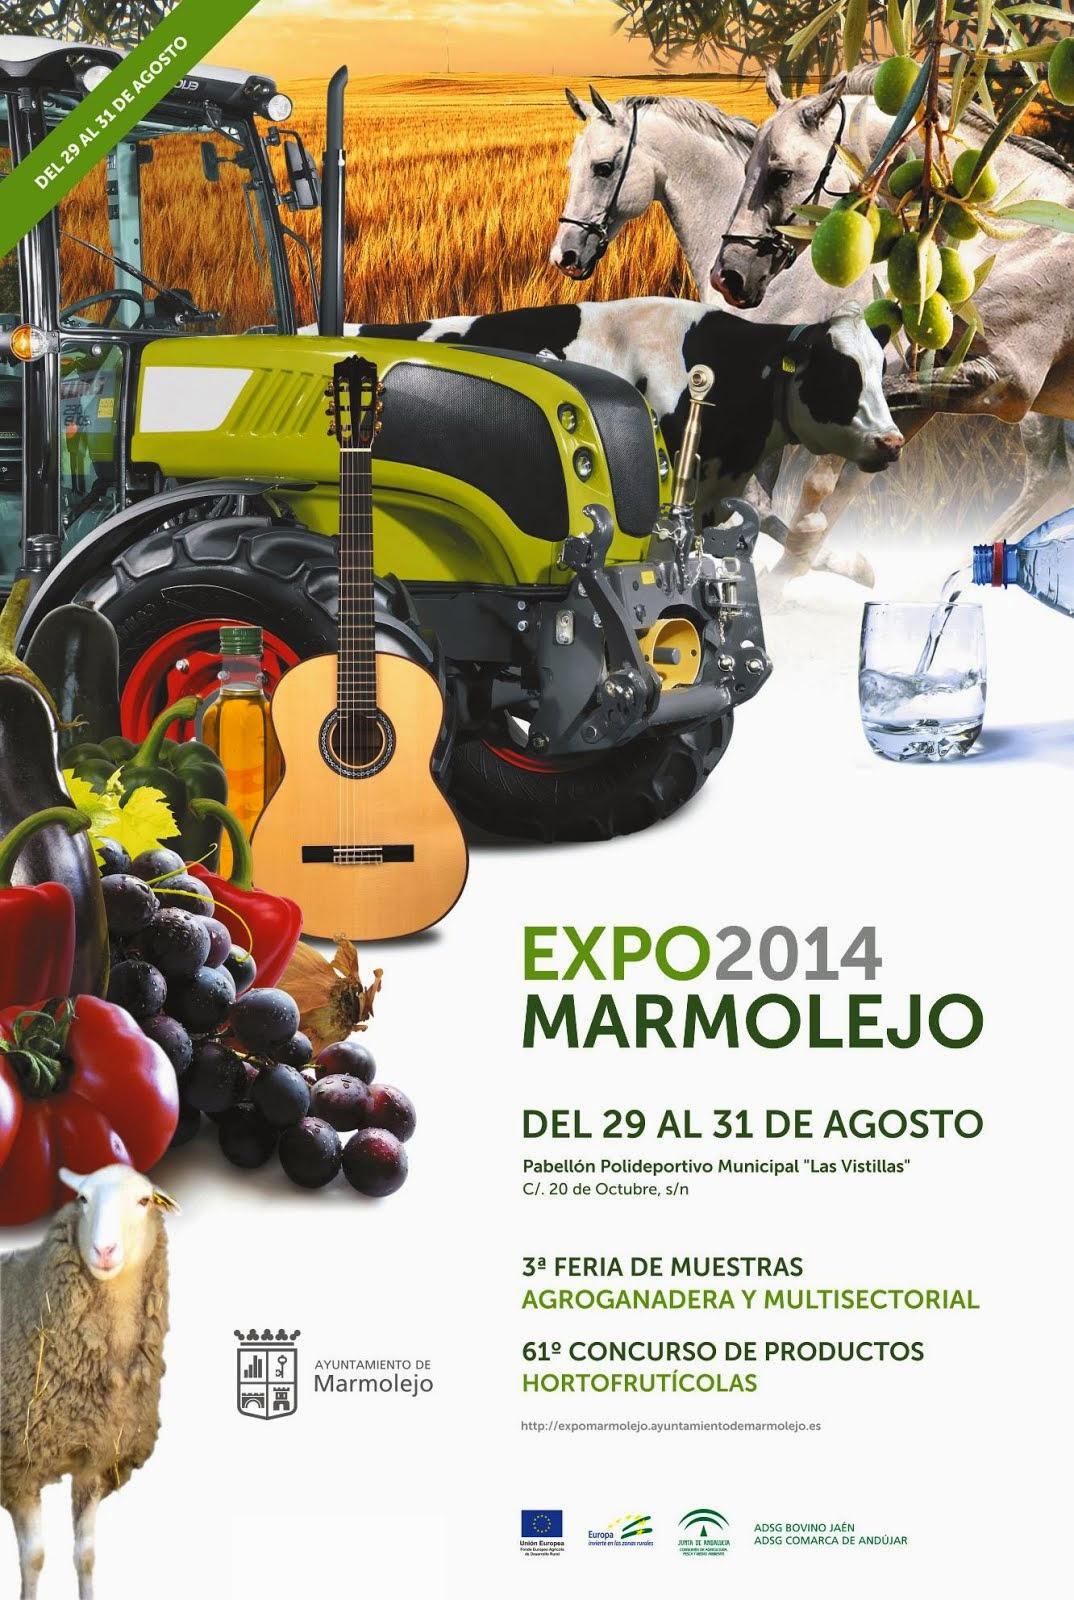 ExpoMarmolejo 2014